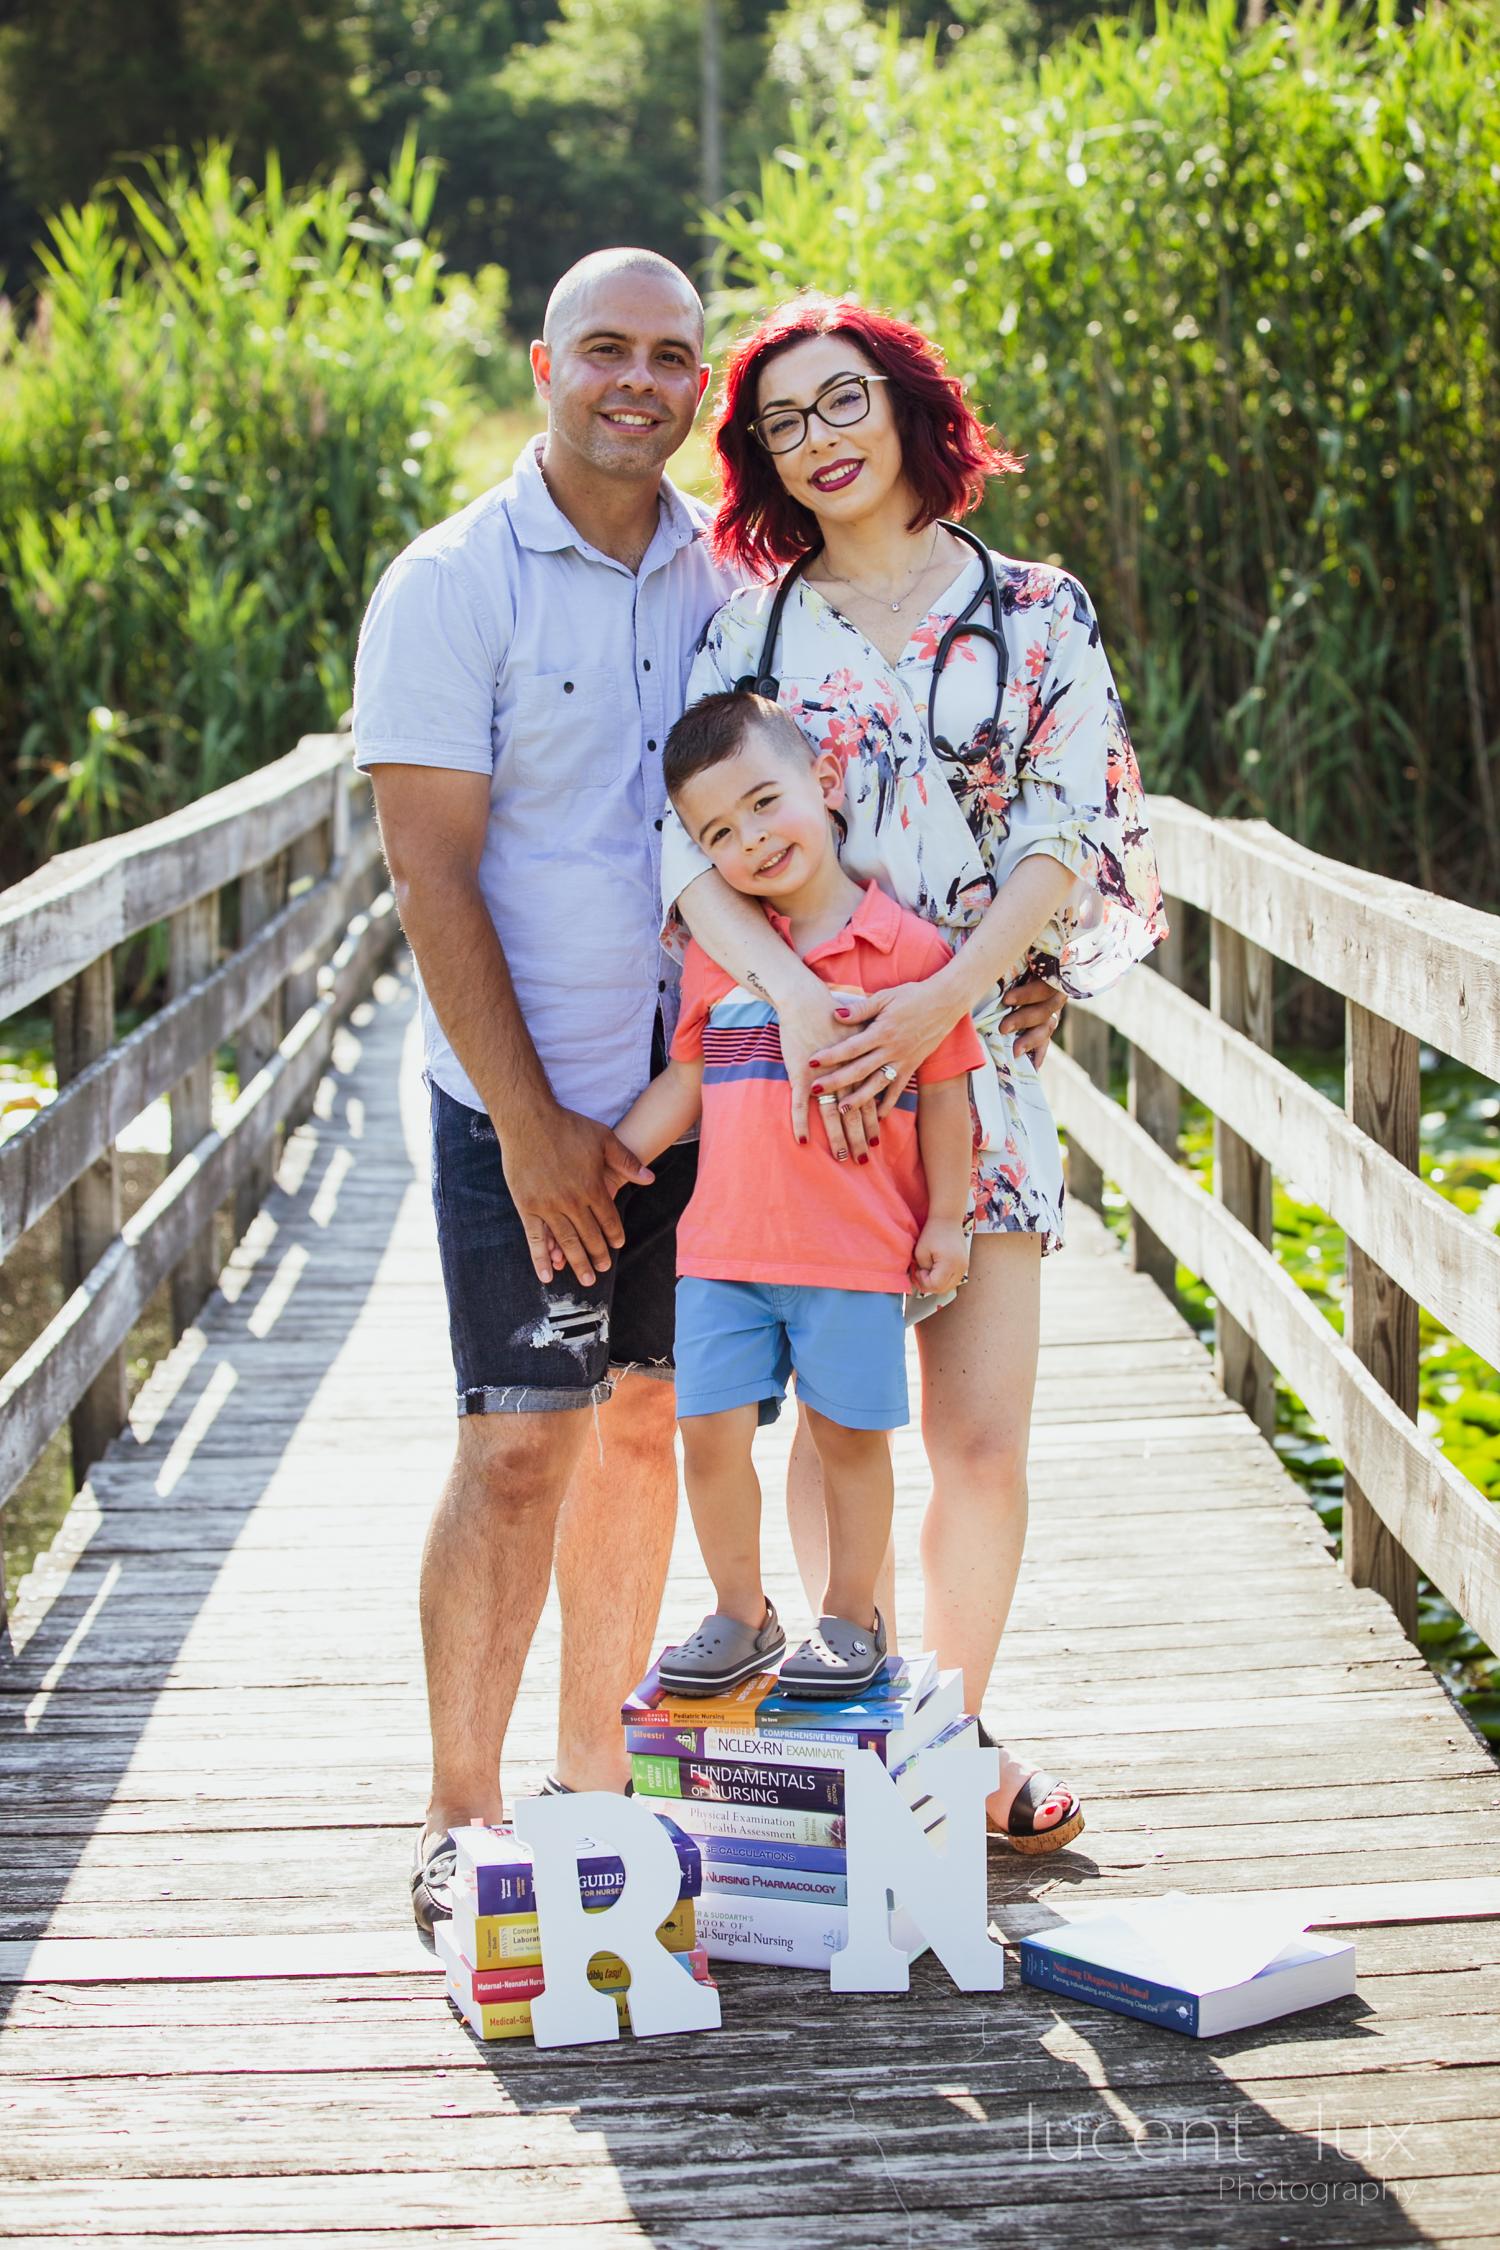 family-portraits-photography-harford-glen-park-bel-air-maryland-photographer-baltimore-photography-local-park-111.jpg